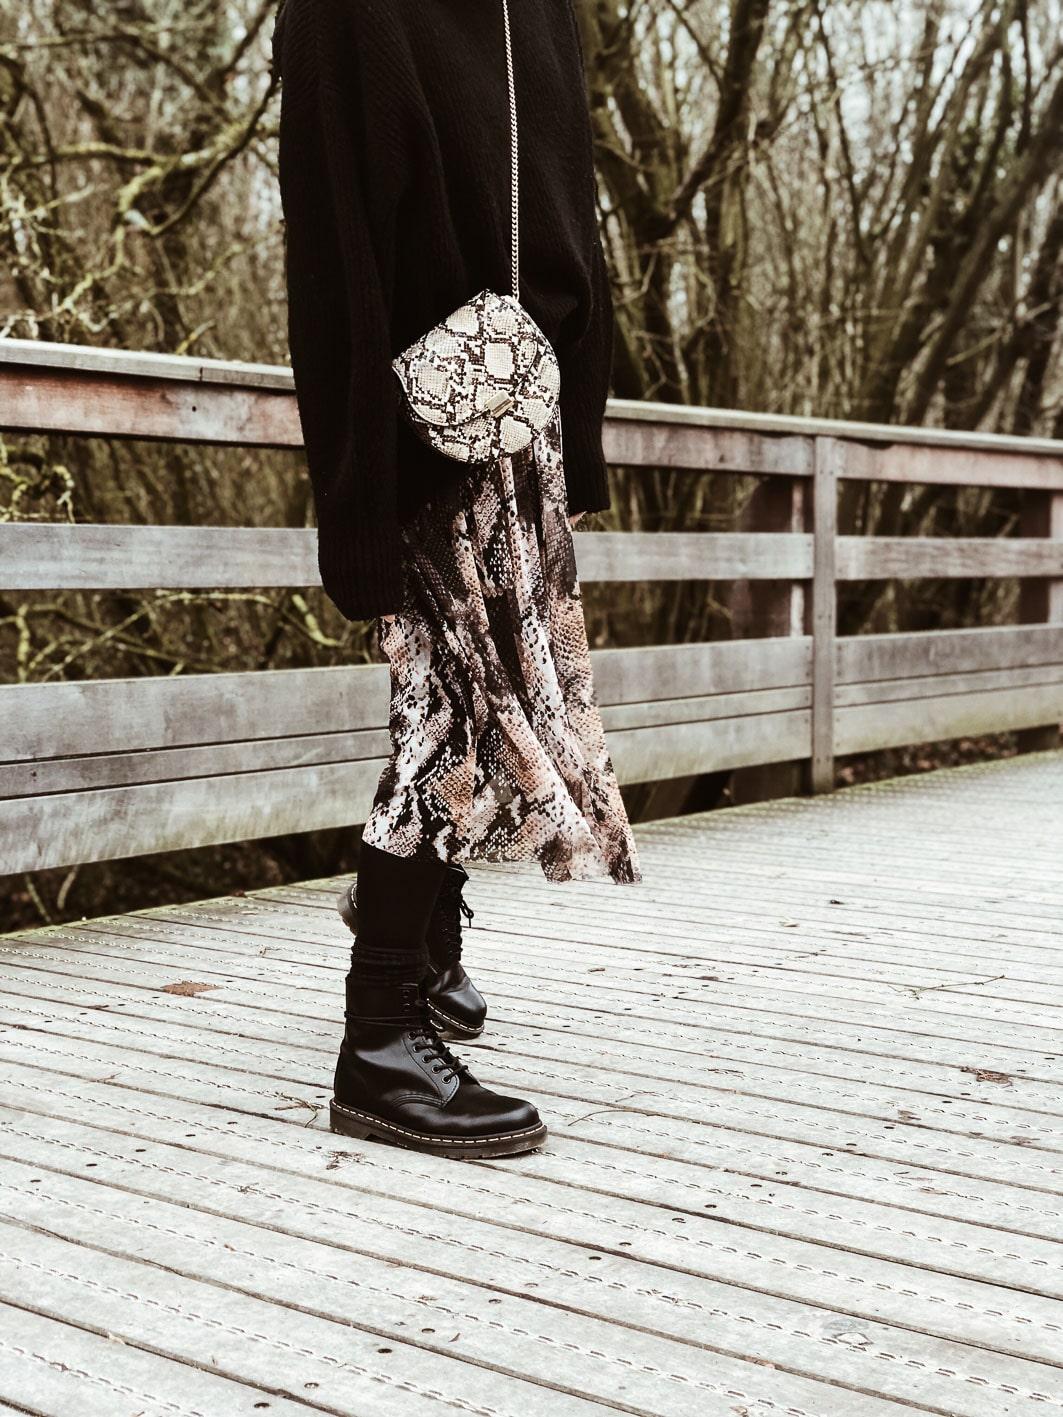 Carnet Sauvage - Blog mode boho et tendances, idée look hiver, jupe python zara, pull &other stories, sac python mango